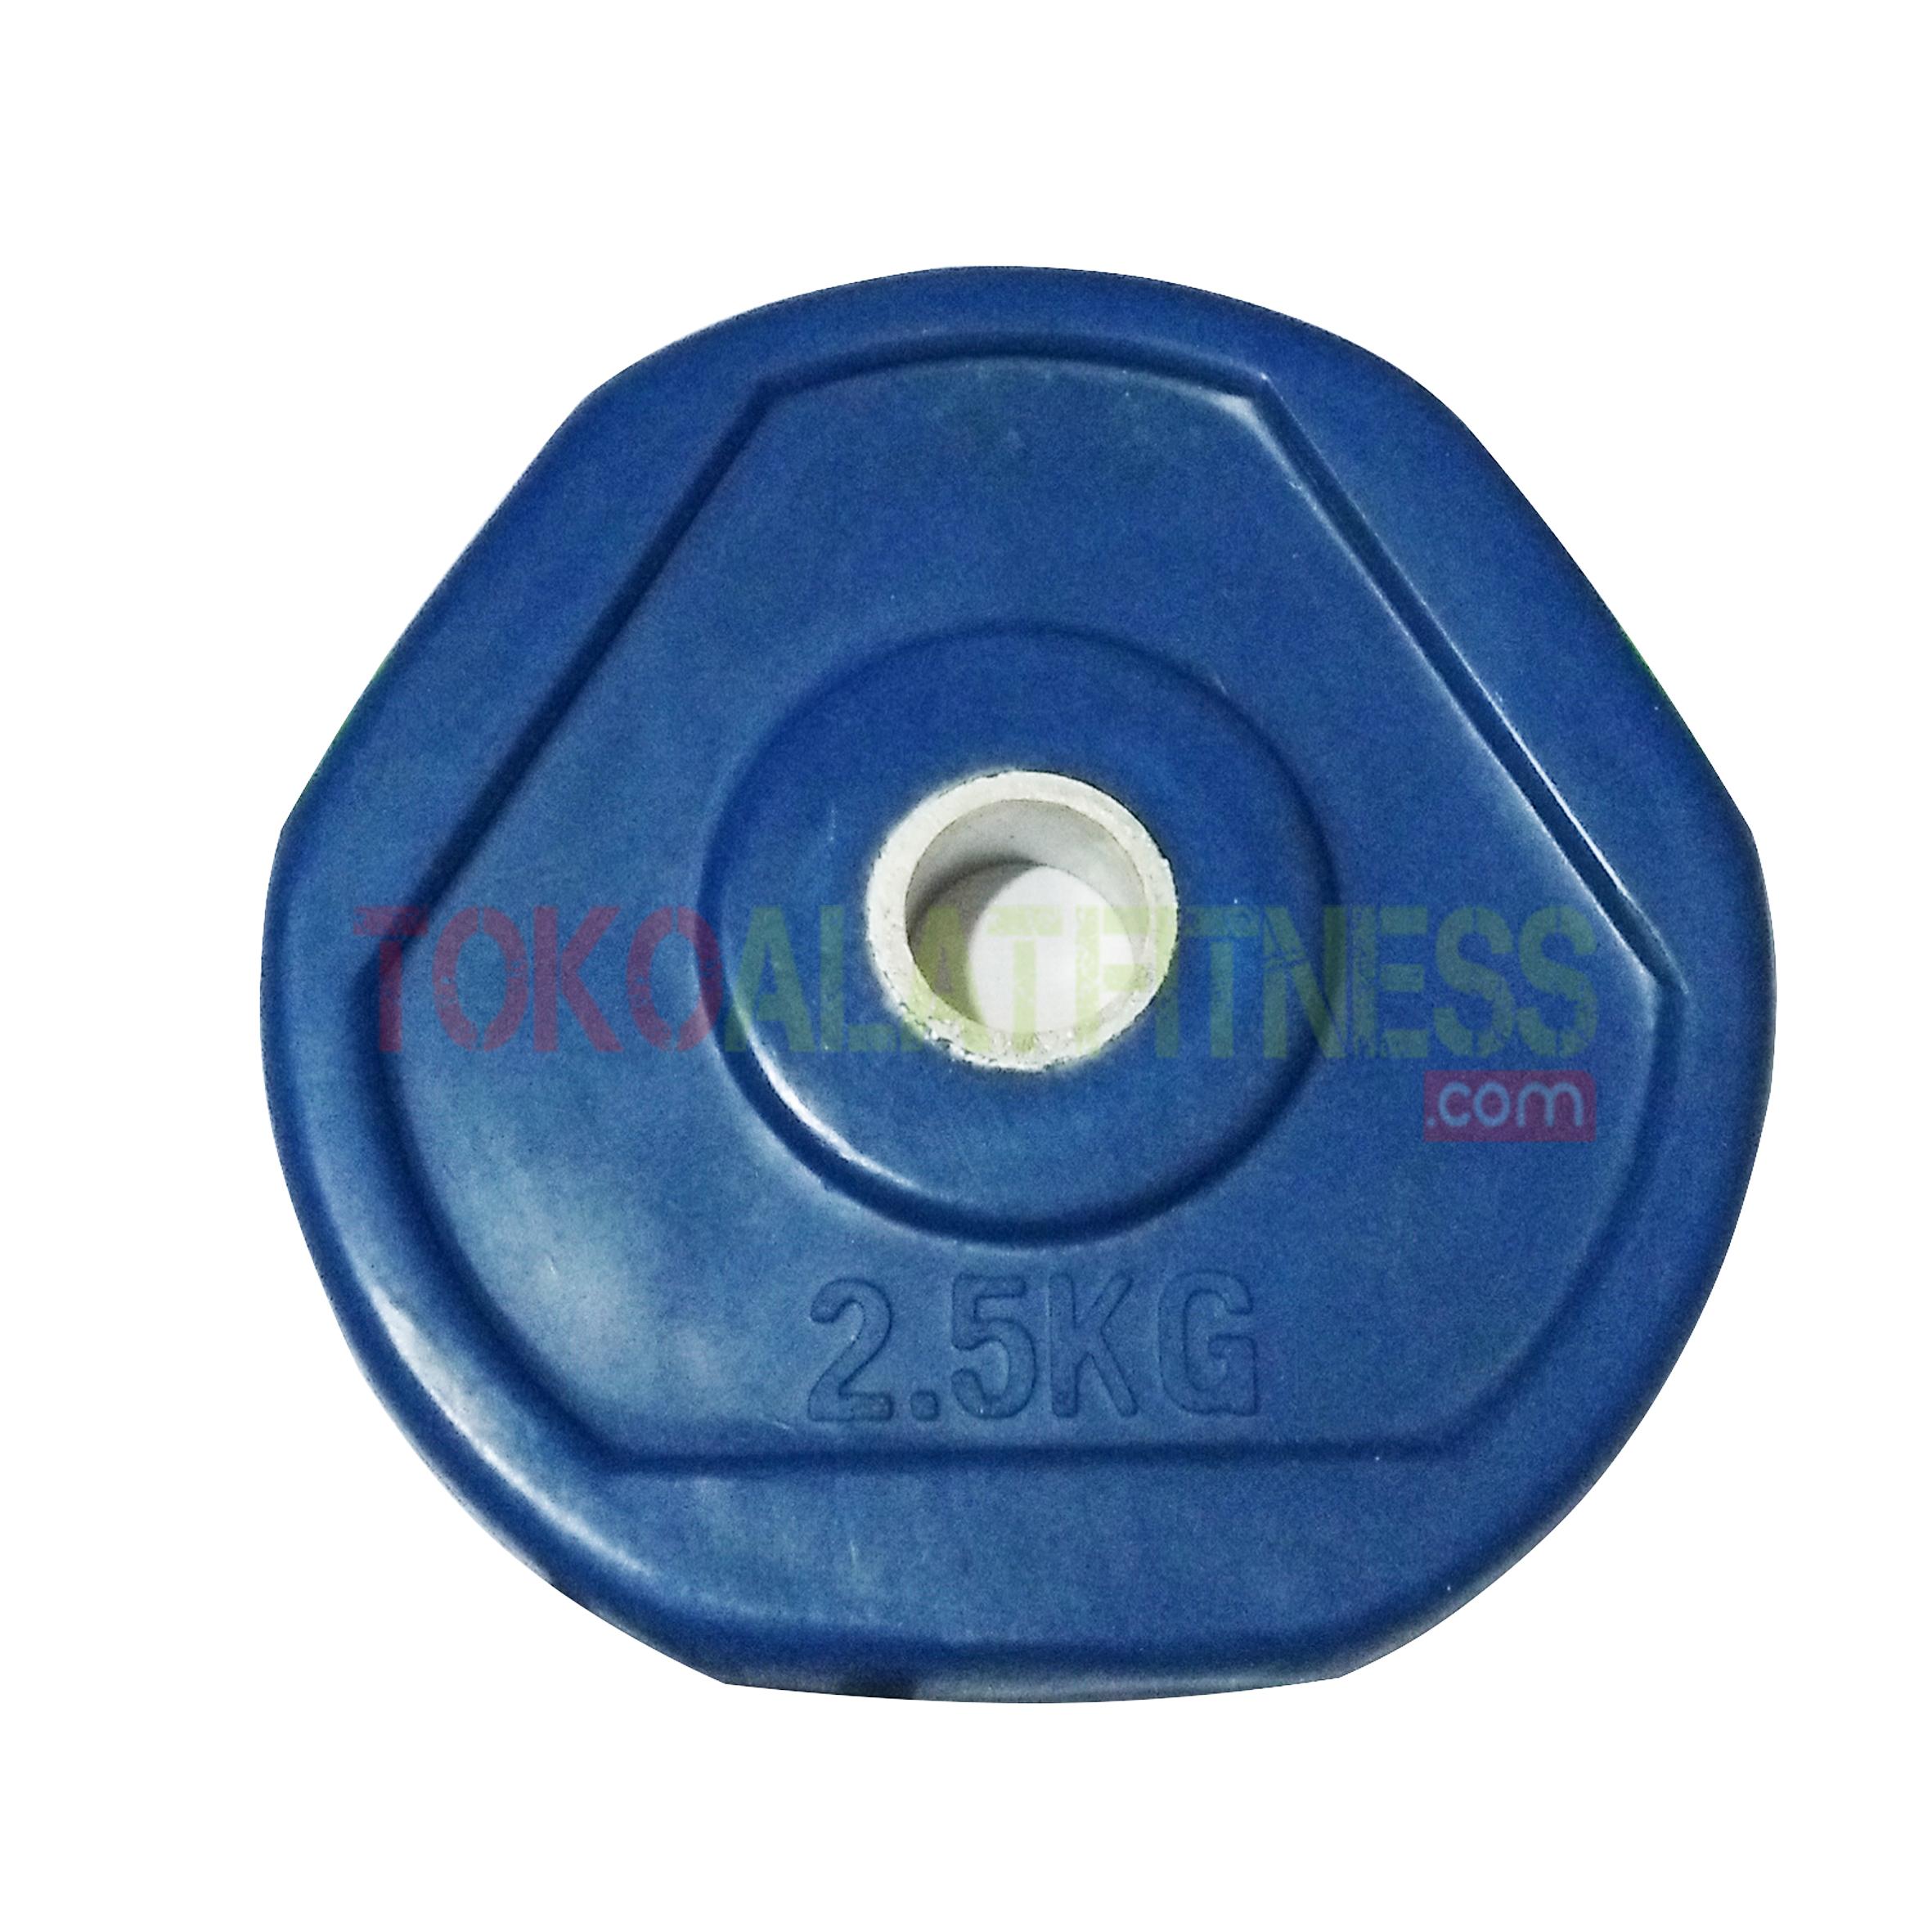 rubber plate biru 25 kg wtm - Rubber Plate Grip Warna 3cm Biru 2.5kg Body Gym